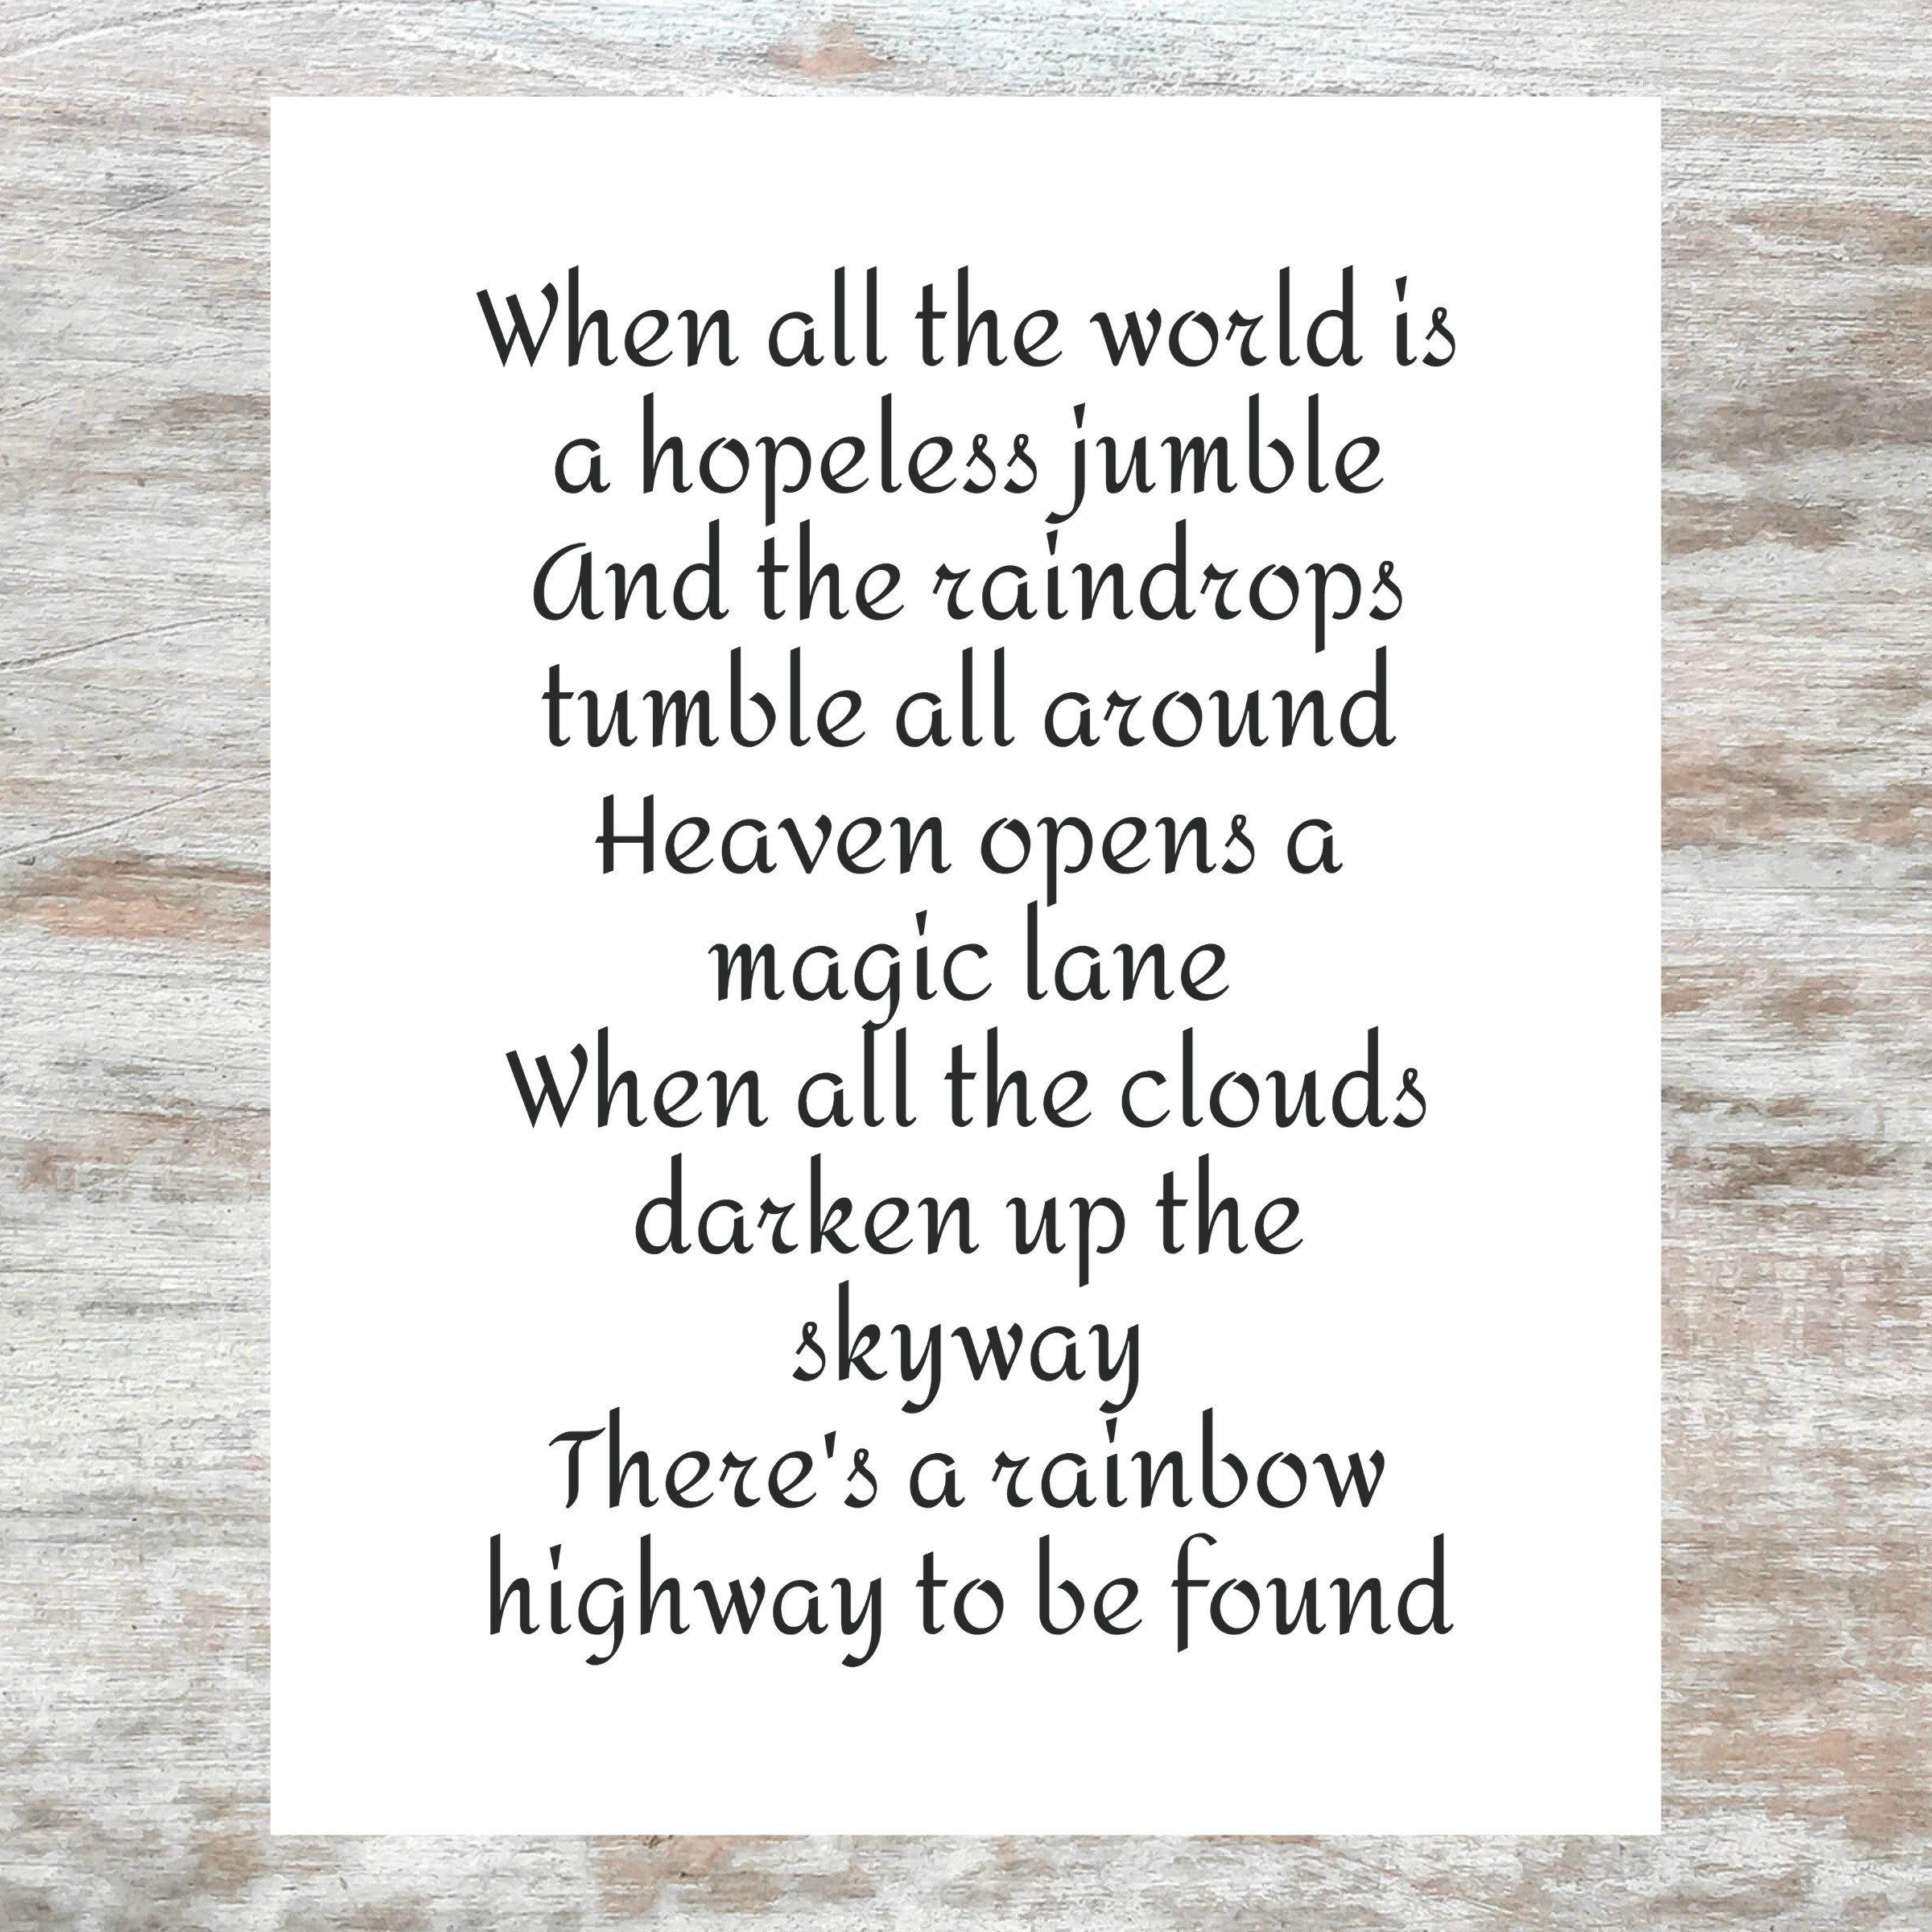 When All The World Is A Hopeless Jumble And The Raindrops Tumble All Around Heaven Opens A Magic Lane Lady Gaga Lyrics Printable In 2020 Lady Gaga Lyrics Hopeless Jumbled